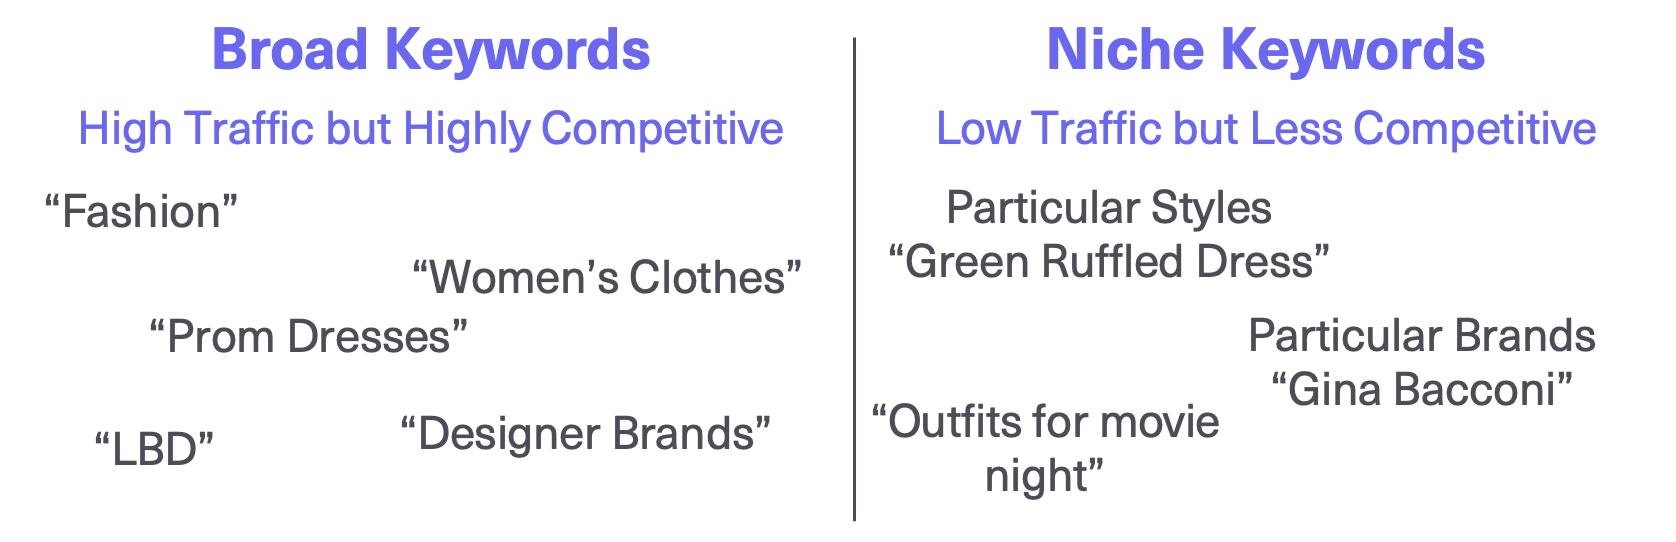 broad and niche keywords seo